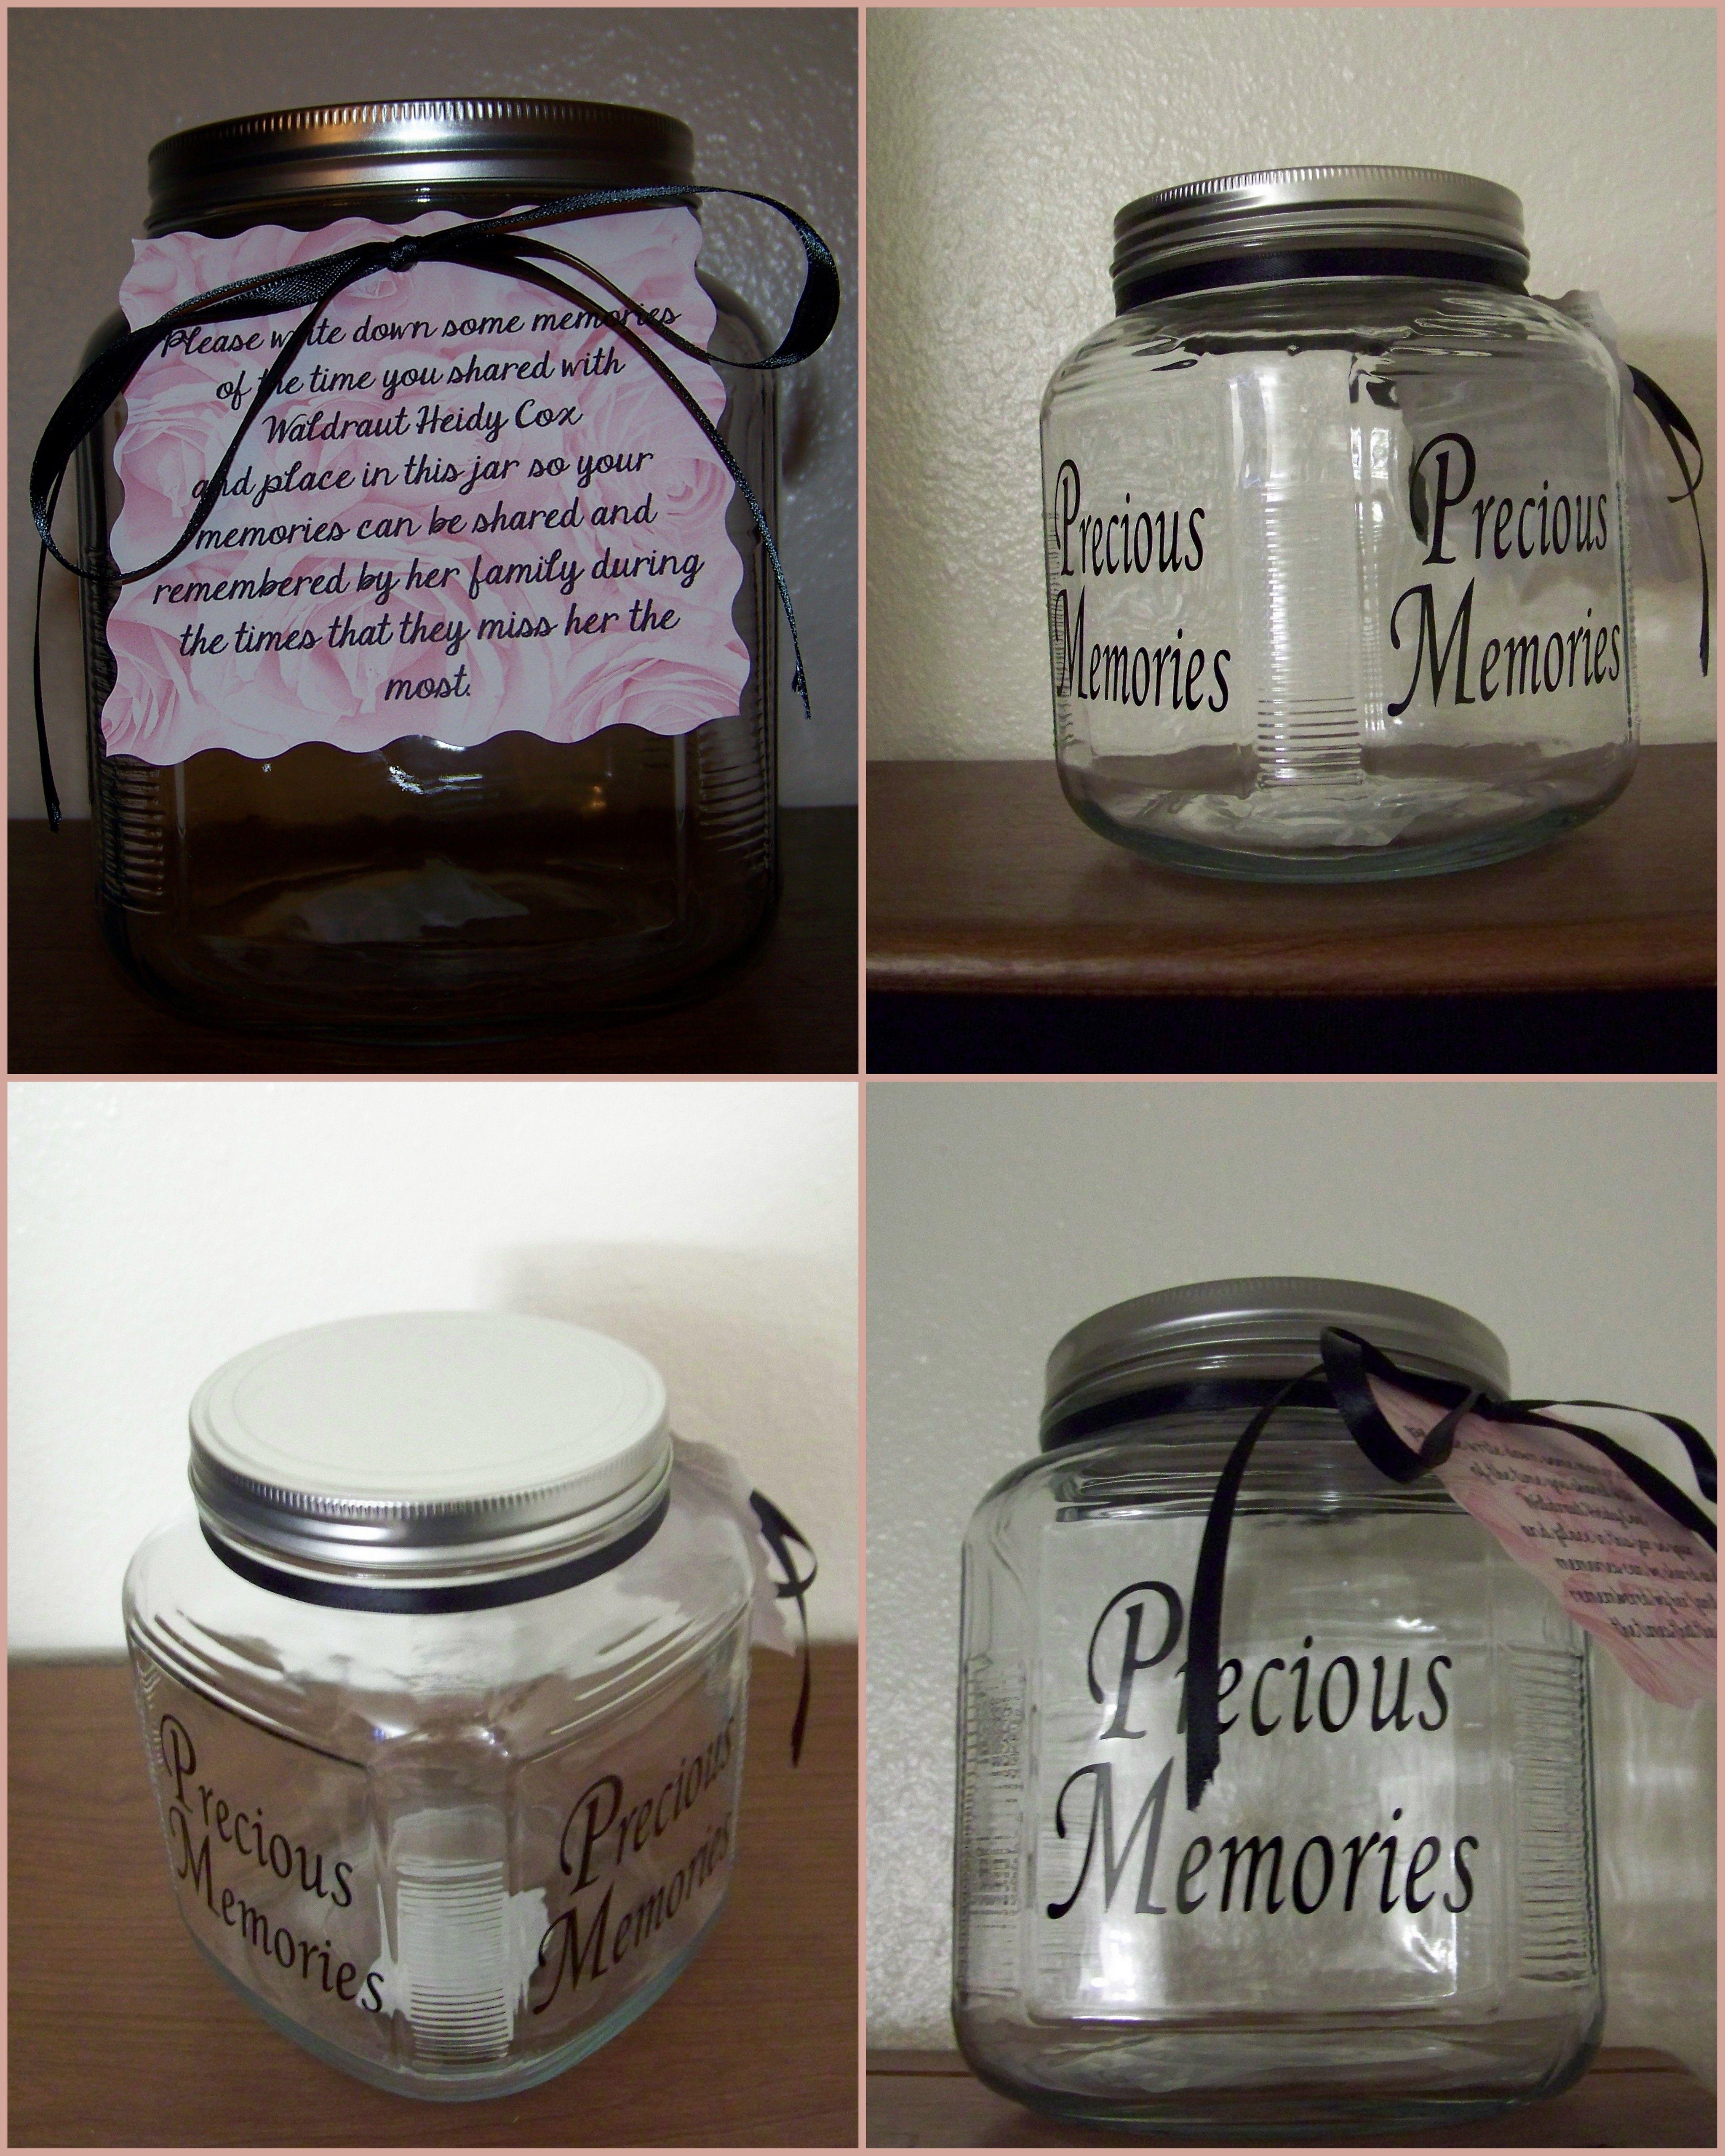 Pin By Gina Johnson On Memorial Ideas Memory Jar Memory Jars Jar